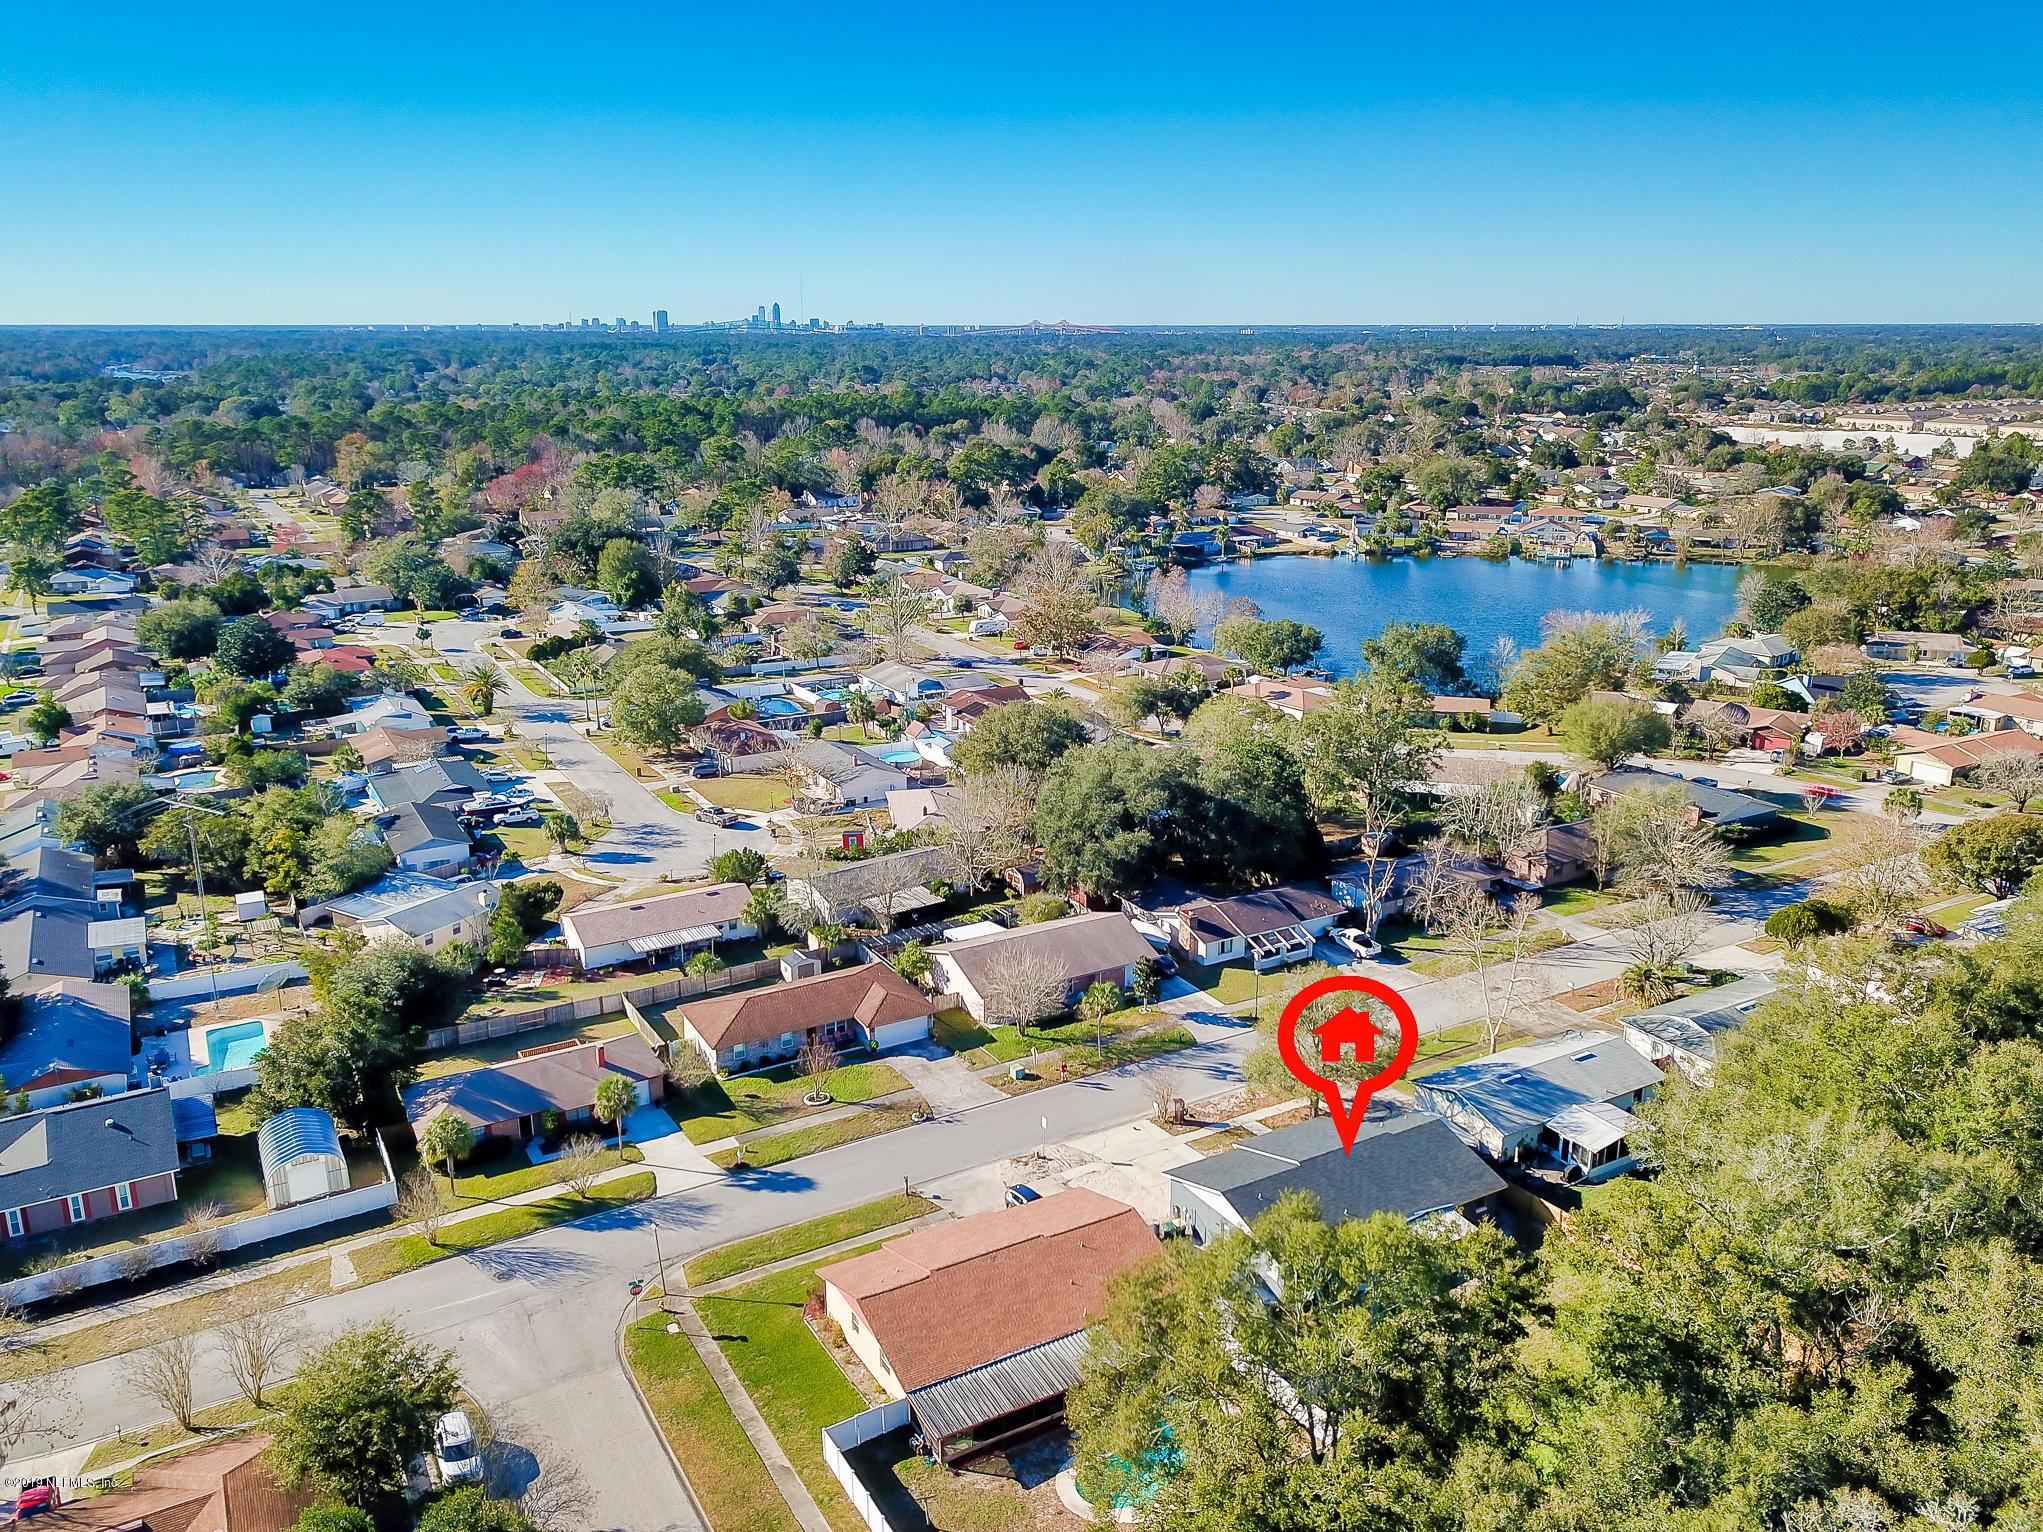 2755 SANDUSKY, JACKSONVILLE, FLORIDA 32216, 4 Bedrooms Bedrooms, ,2 BathroomsBathrooms,Residential - single family,For sale,SANDUSKY,974155